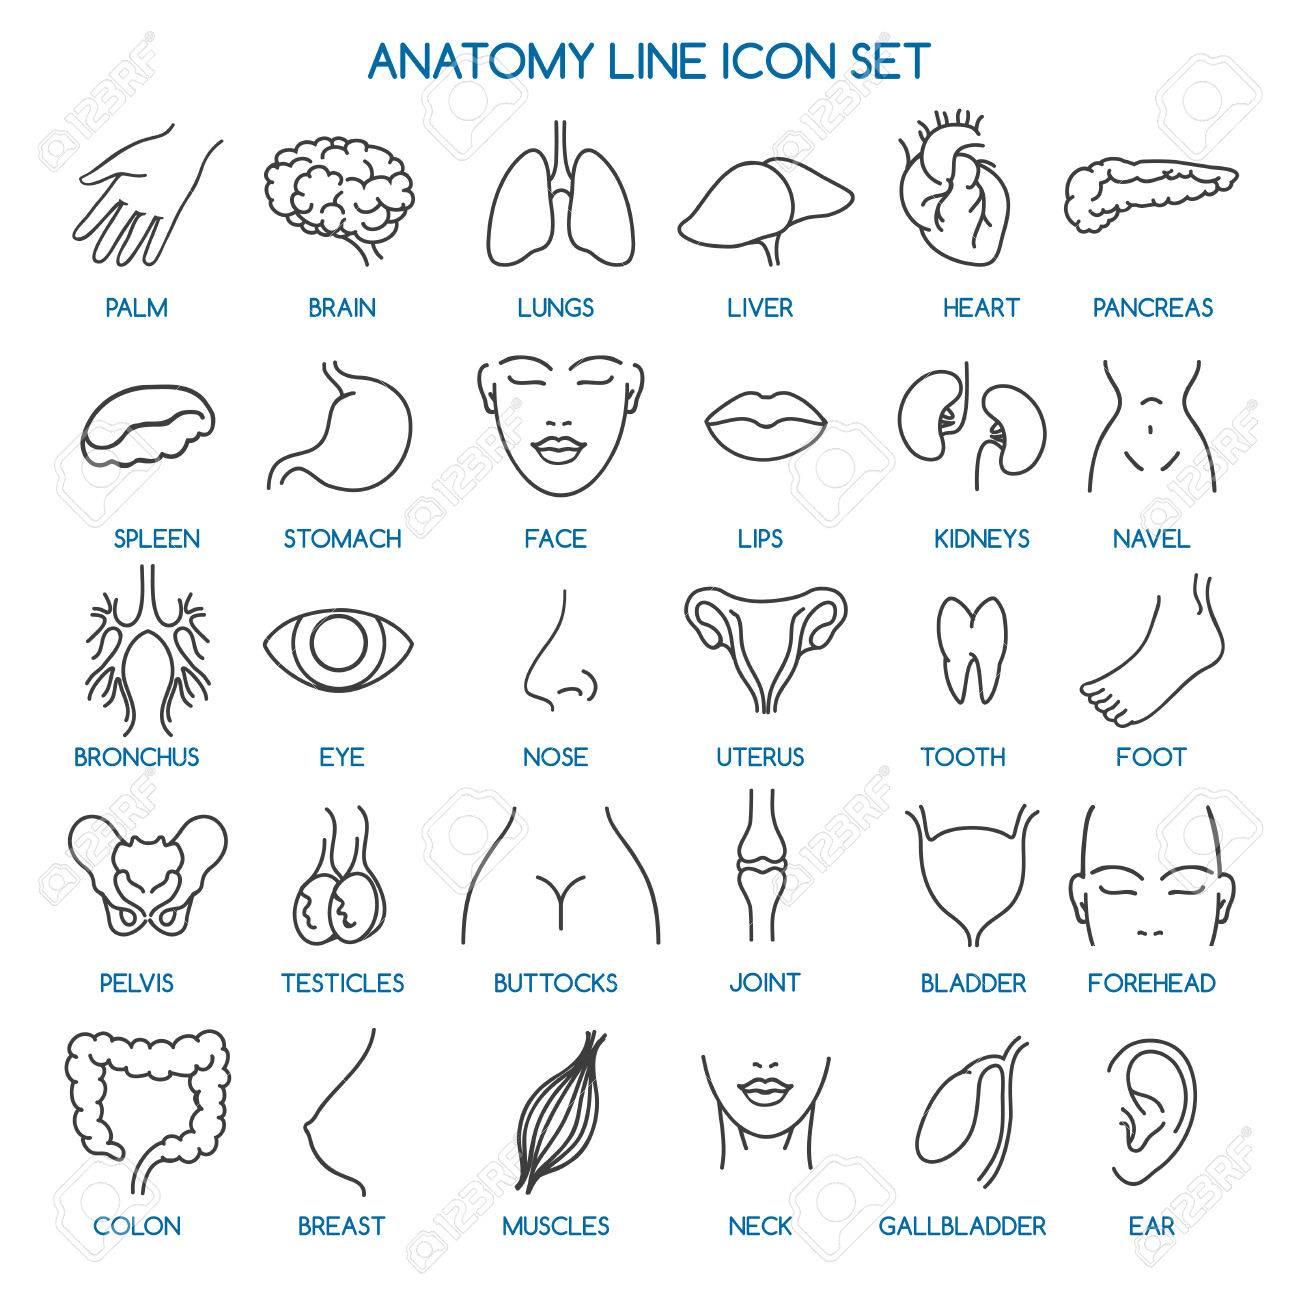 Anatomy Line Icons. Human Body Parts Line Icons And Human Anatomy ...